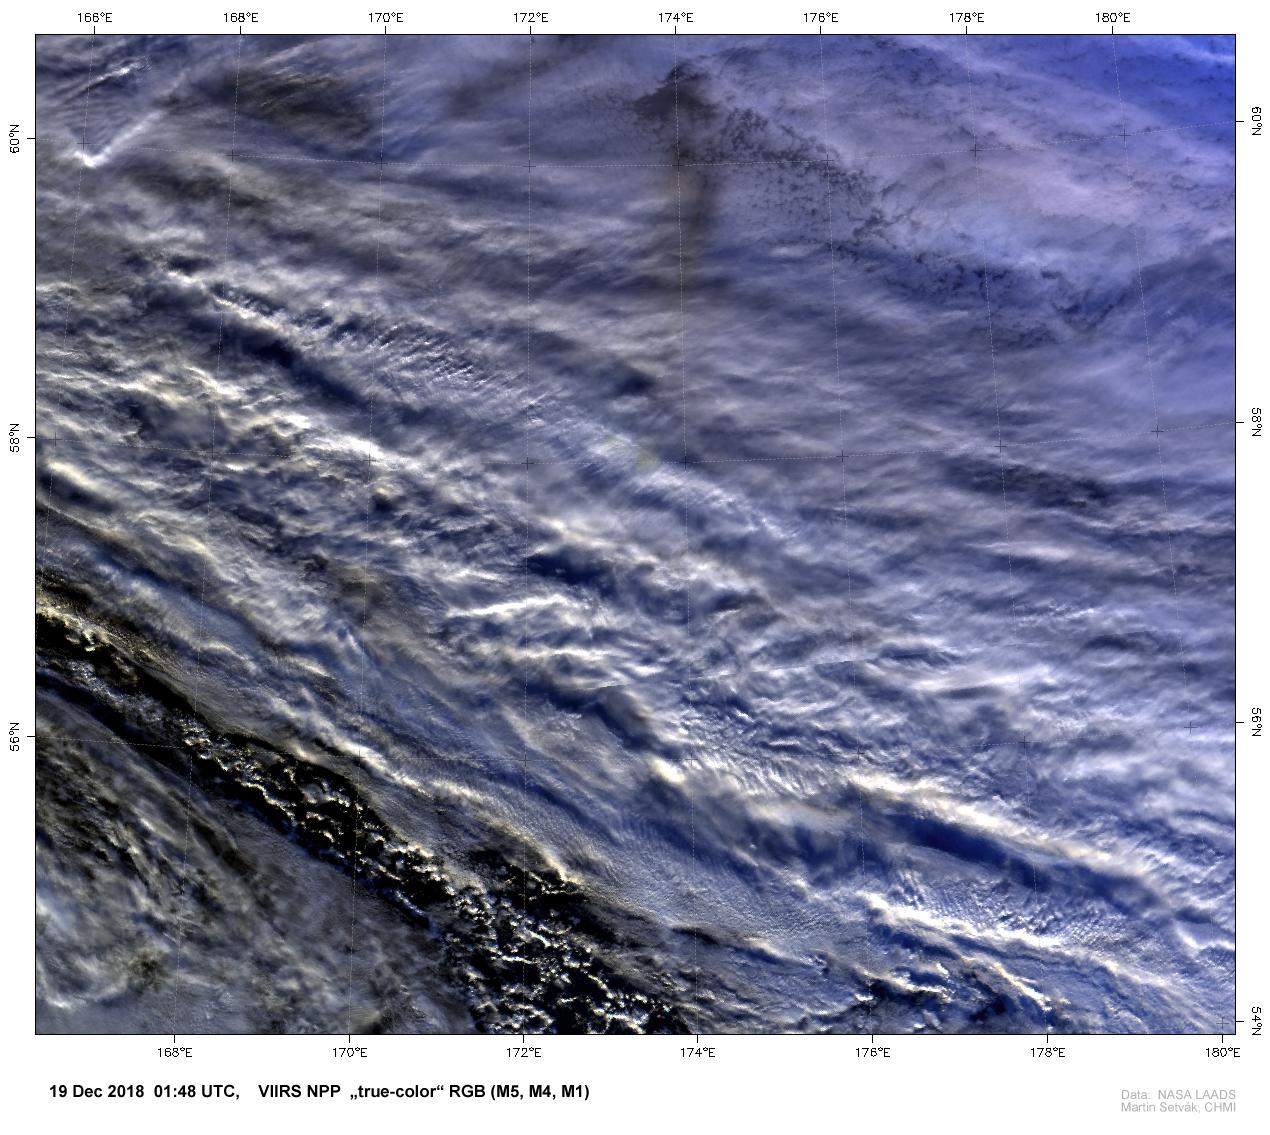 SNPP VIIRS, 19 Dec, 01:48 UTC